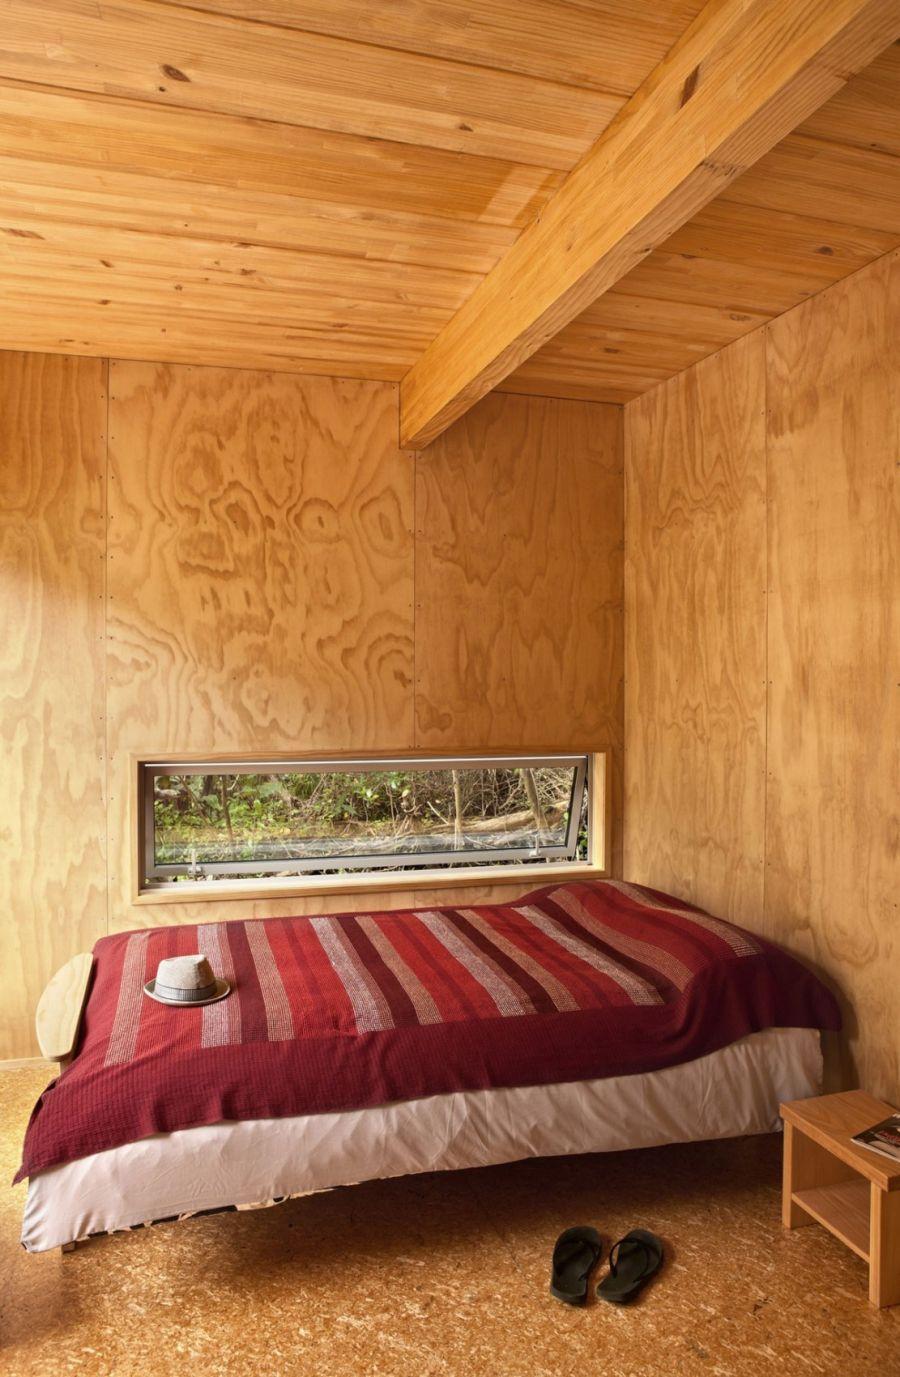 Cabin-styled bedroom design